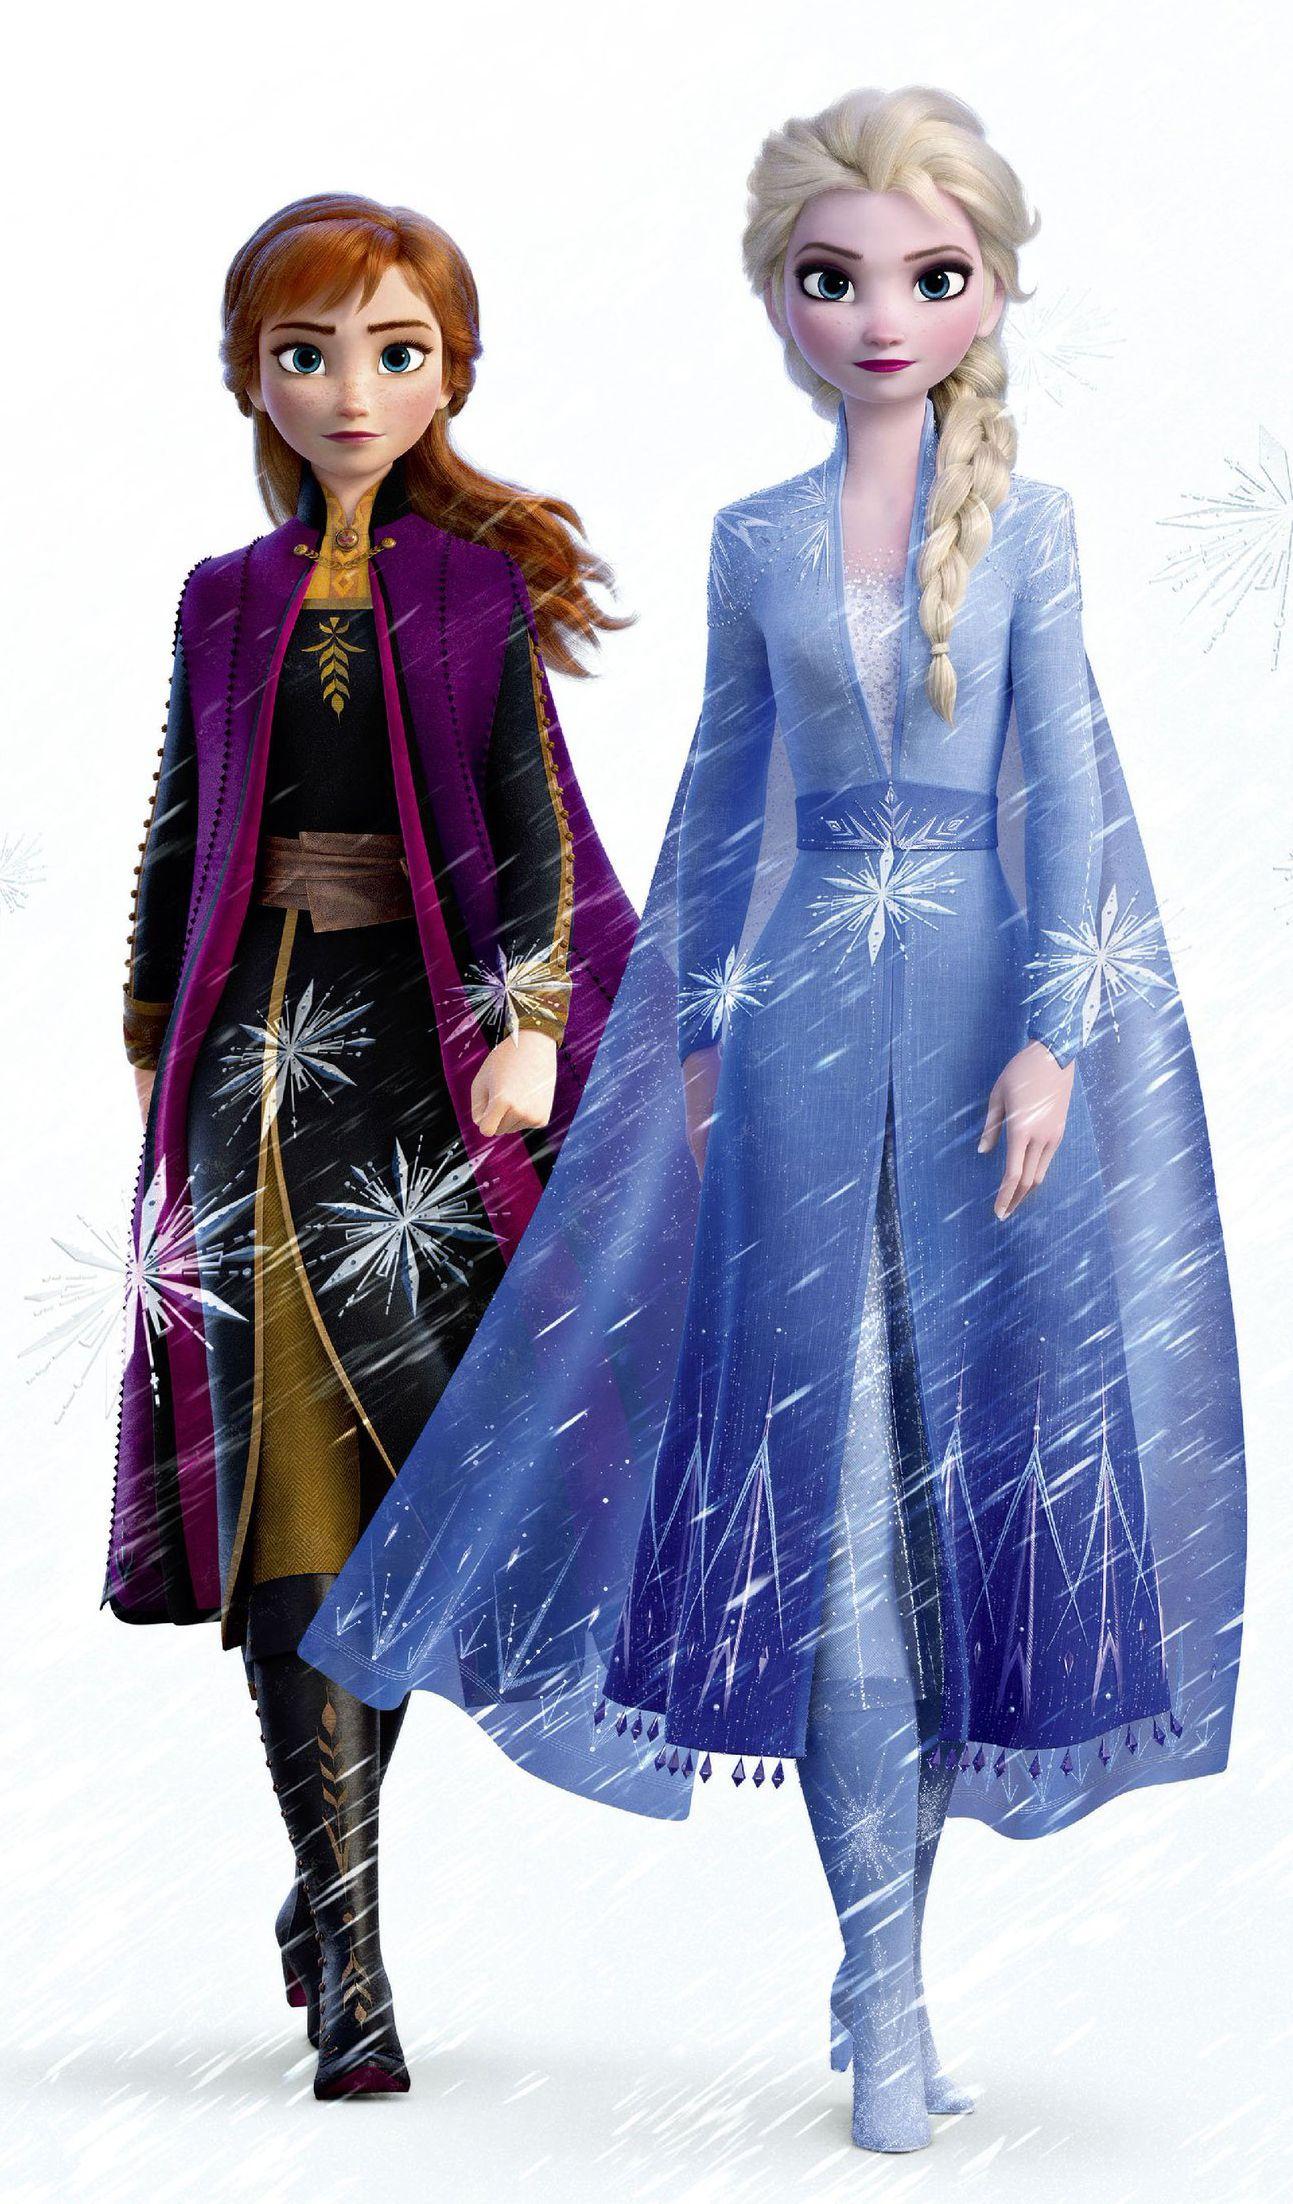 Pin By Elizabeth Svecova On Posters Frozen Disney Movie Disney Princess Frozen Disney Princess Elsa